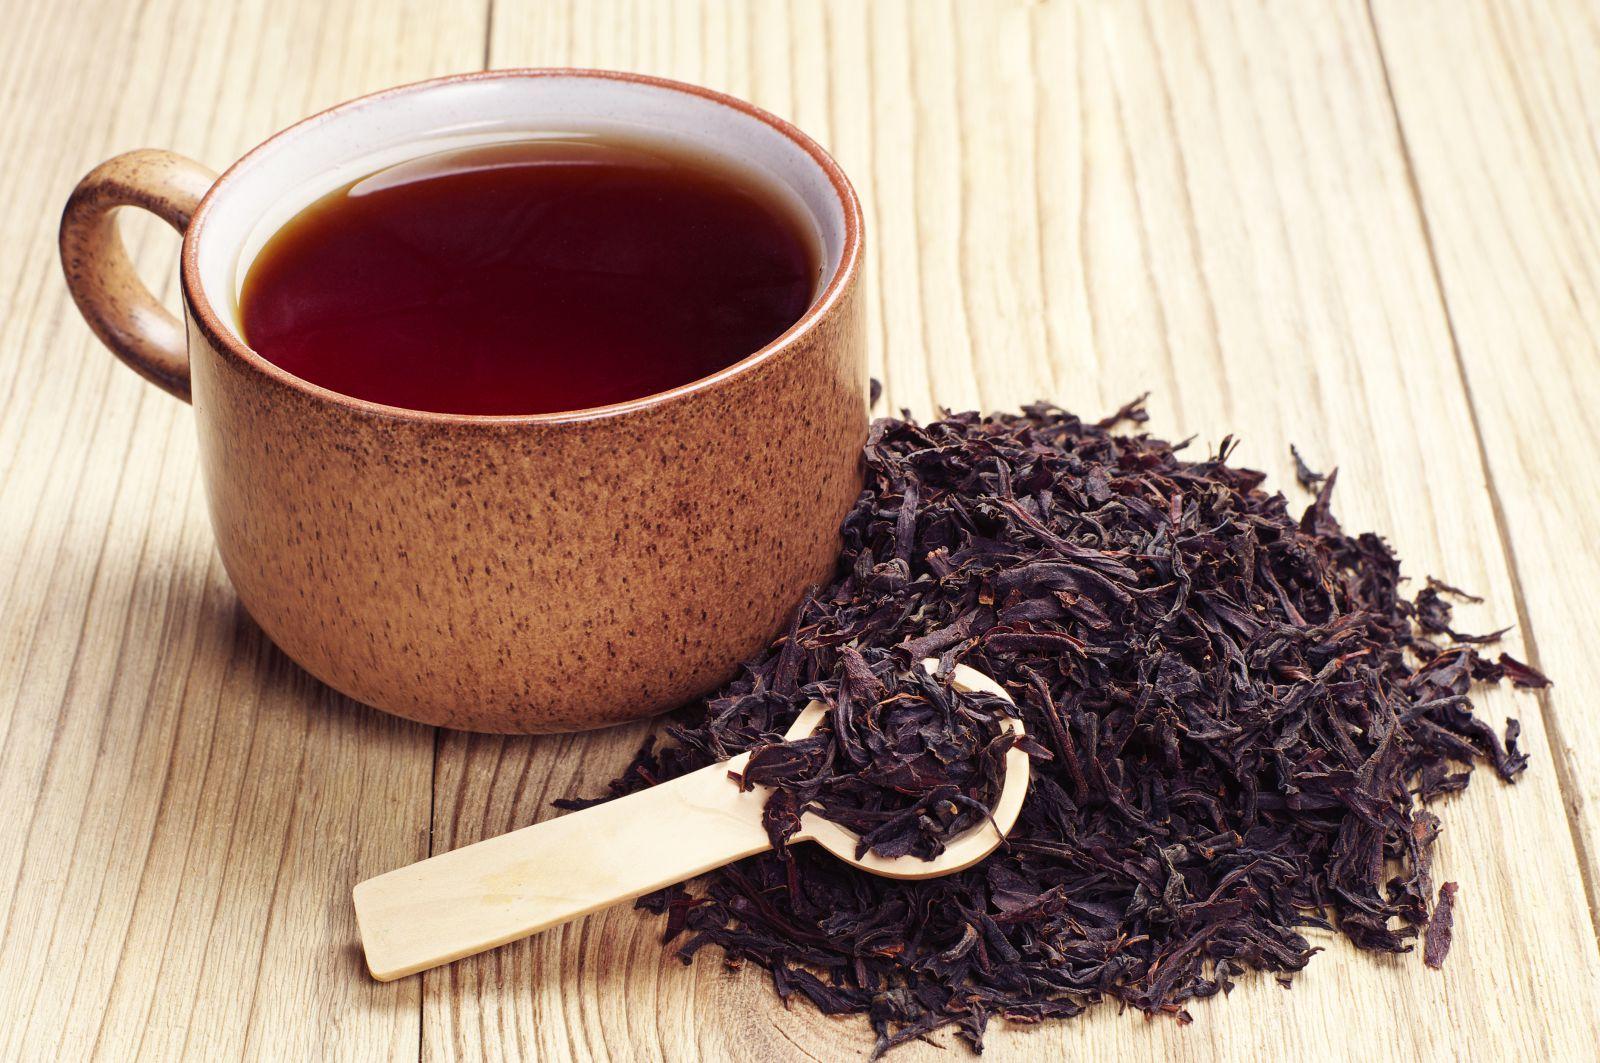 Чай Без Сахара Калорийность На 100 Грамм - советы